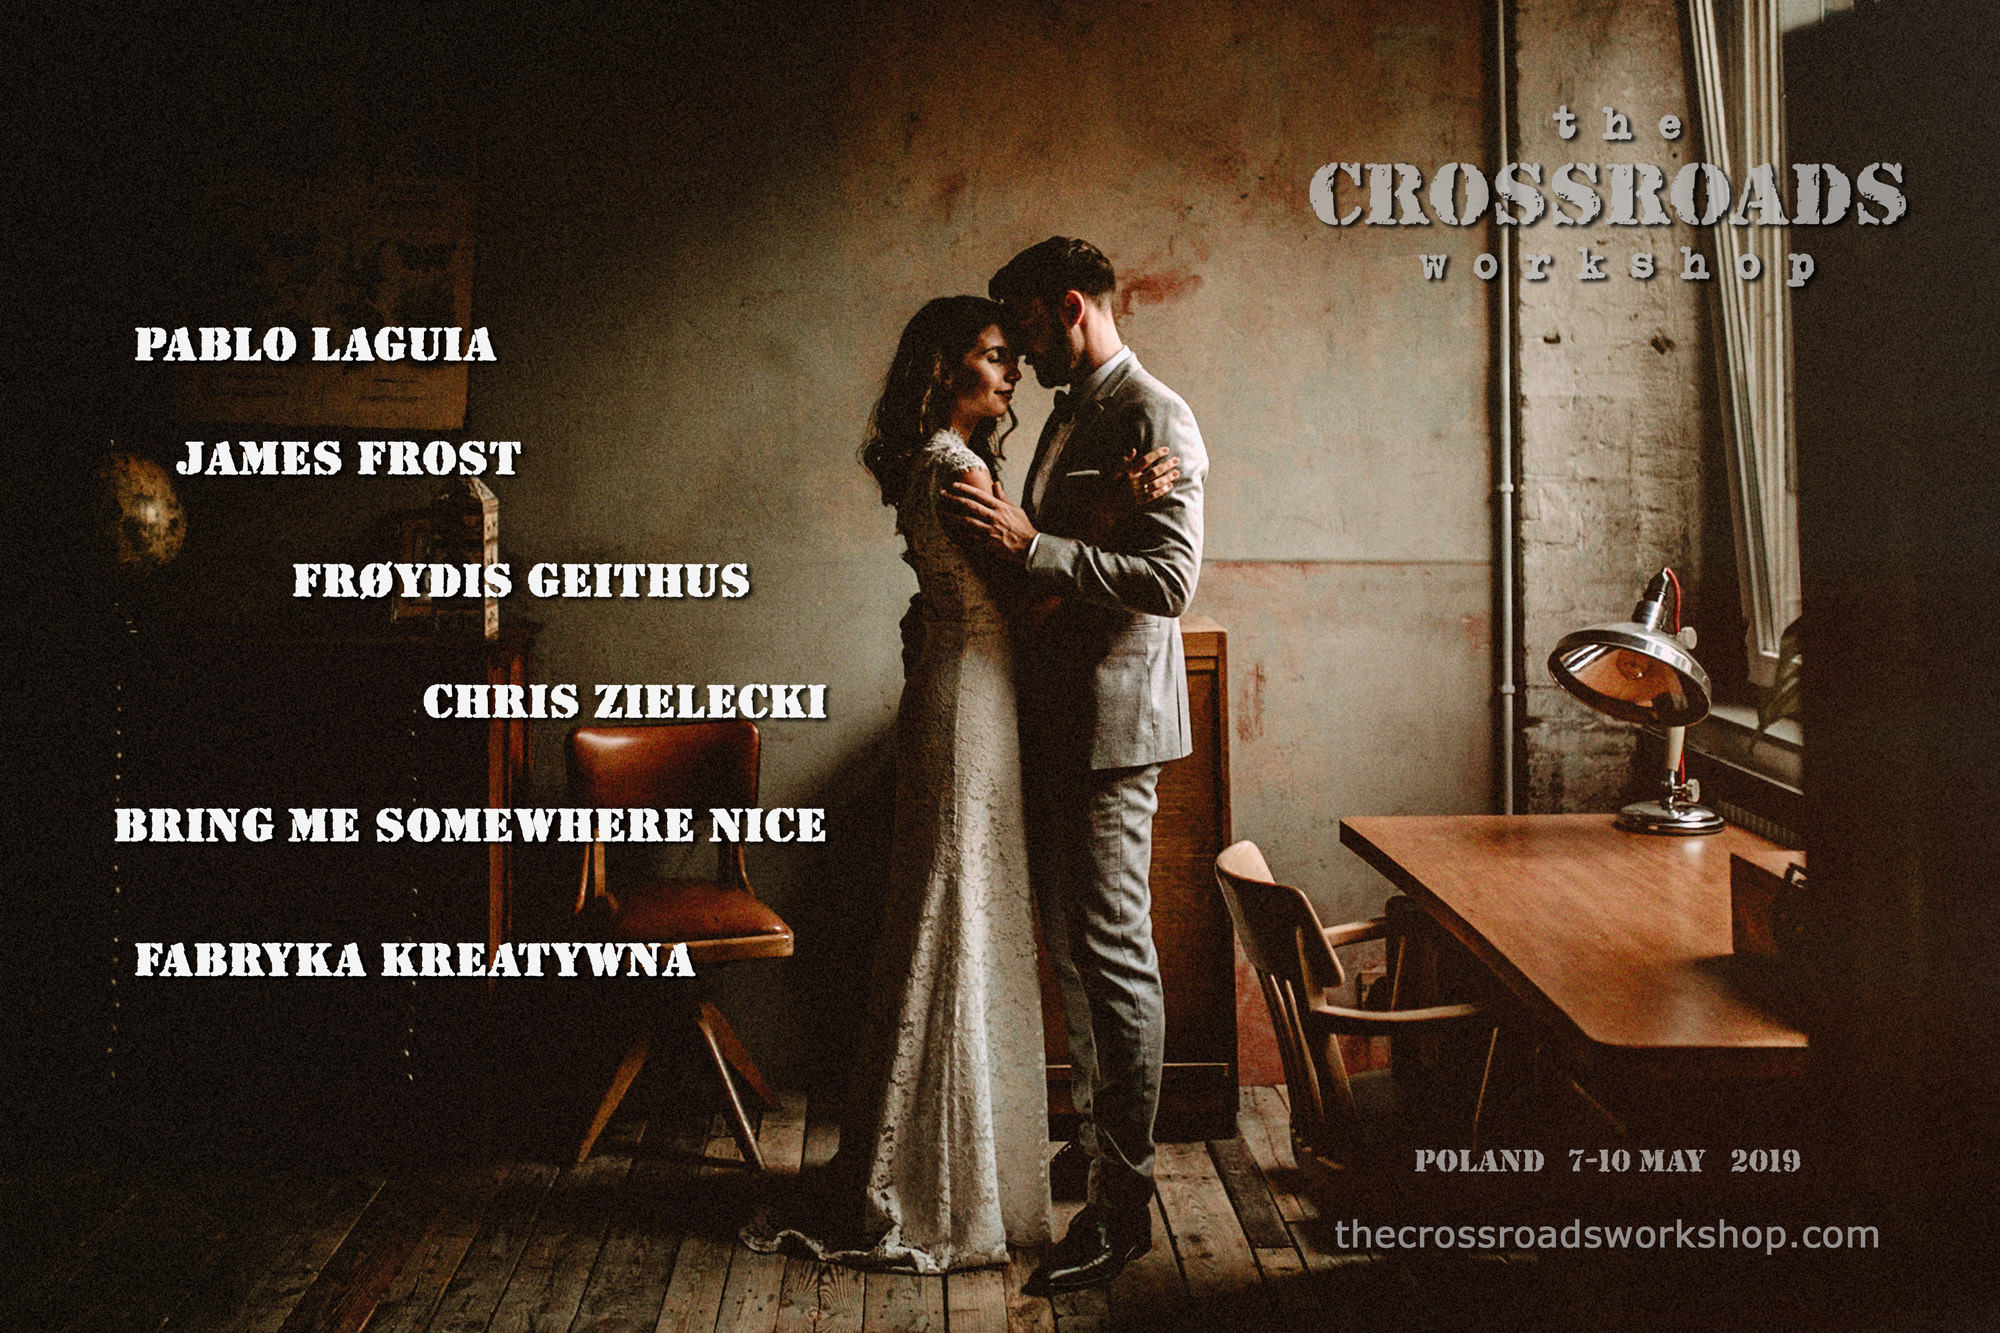 crossroads workshop poland wedding photography